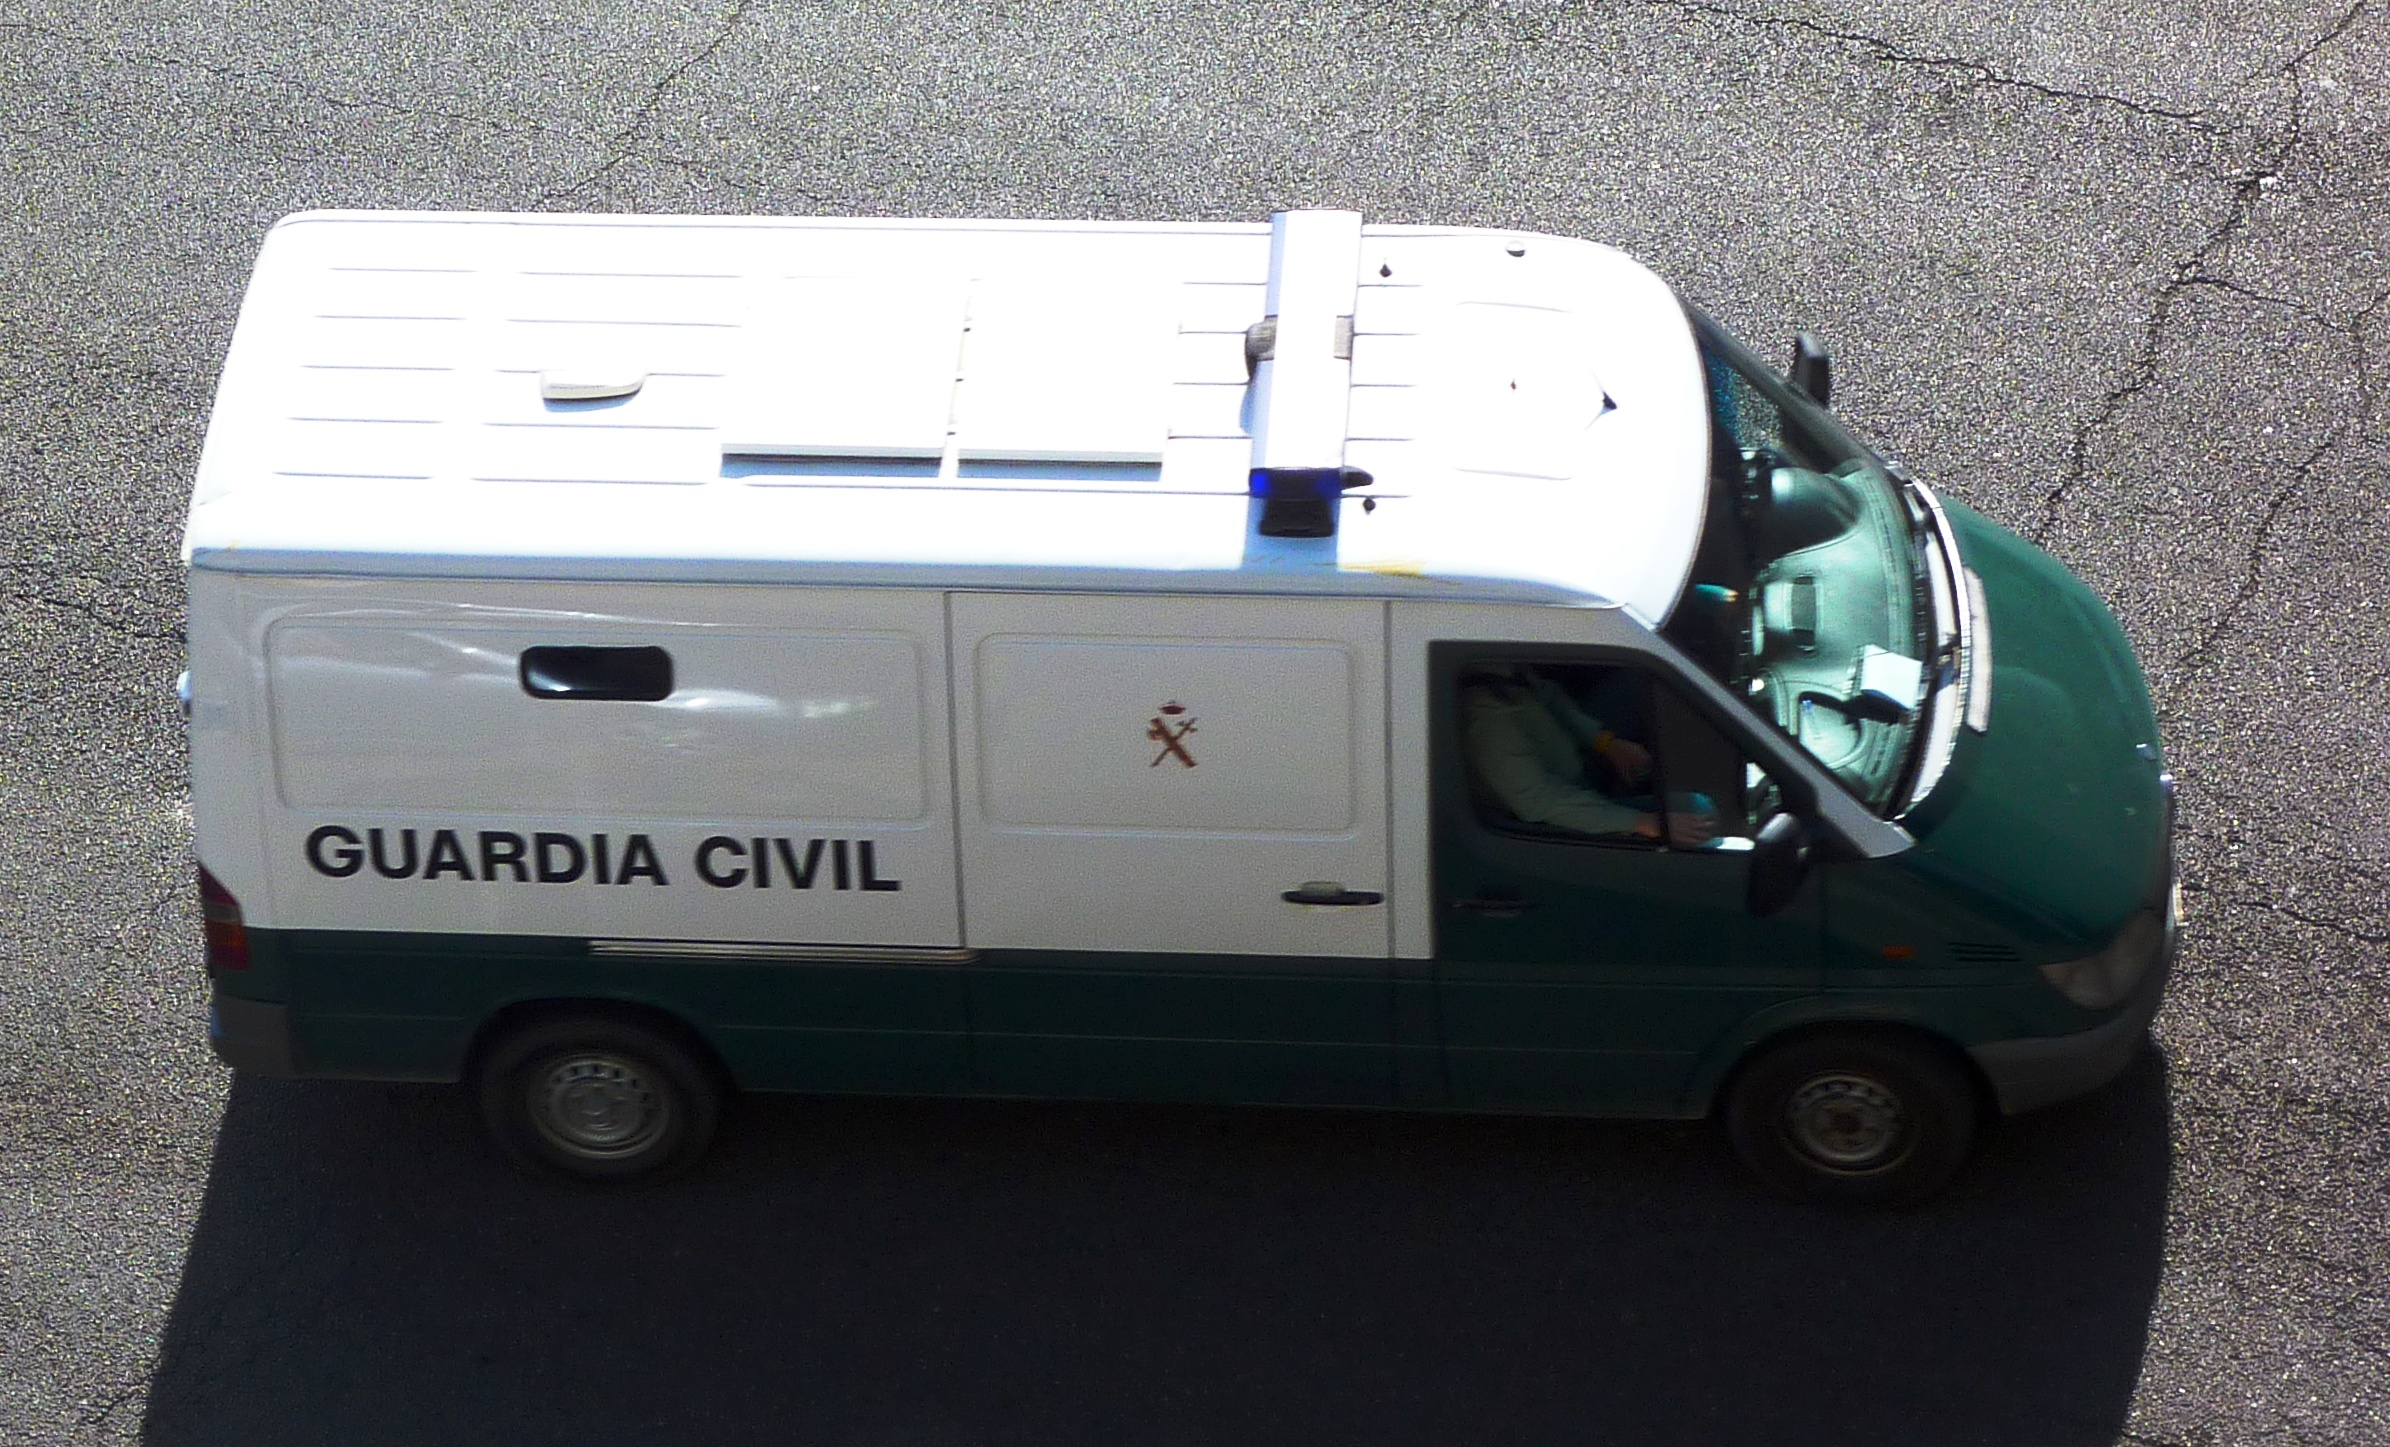 Mercedes Sprinter Wiki >> File:Mercedes-Benz Sprinter Guardia Civil.JPG - Wikimedia ...